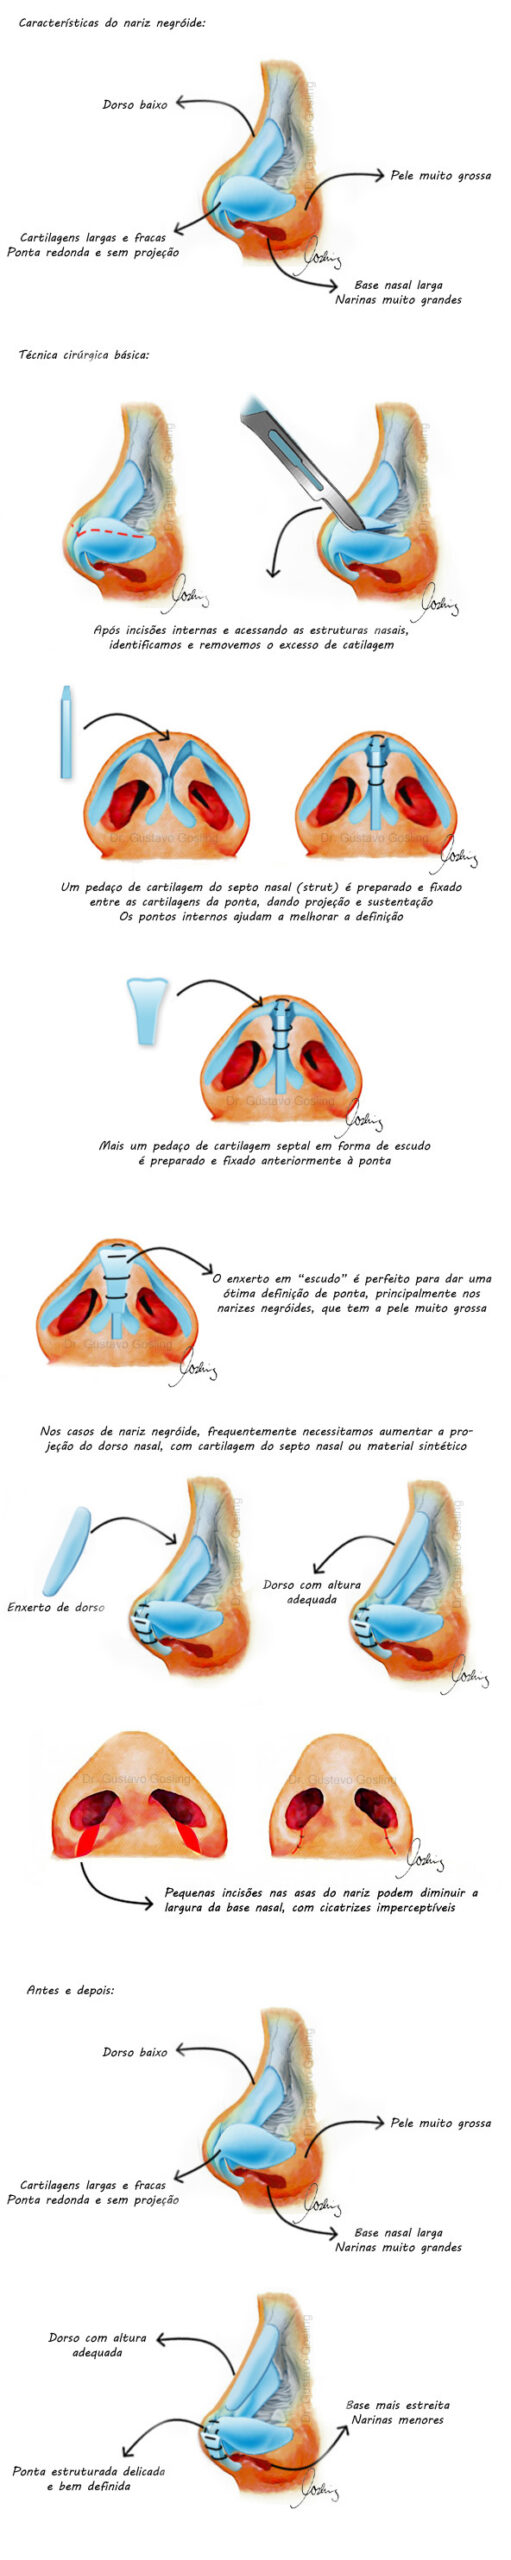 Tecnica rinoplastia nariz negroide